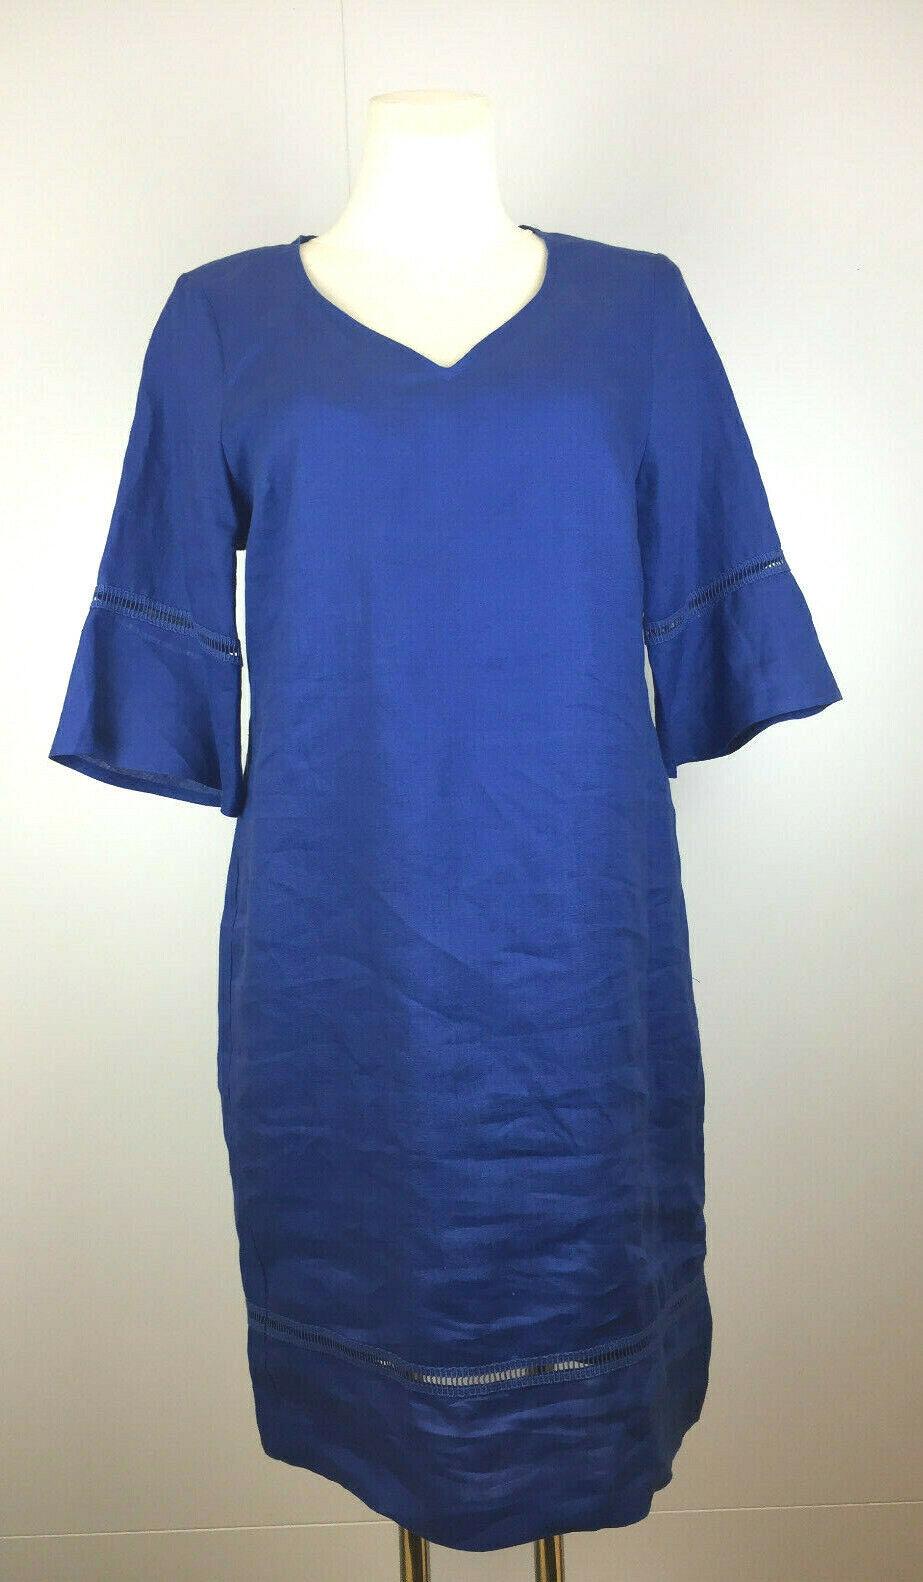 NEU Batida Kleid Style 7768 Leinenkleid royalblue v. Athens Designer Elana Poli